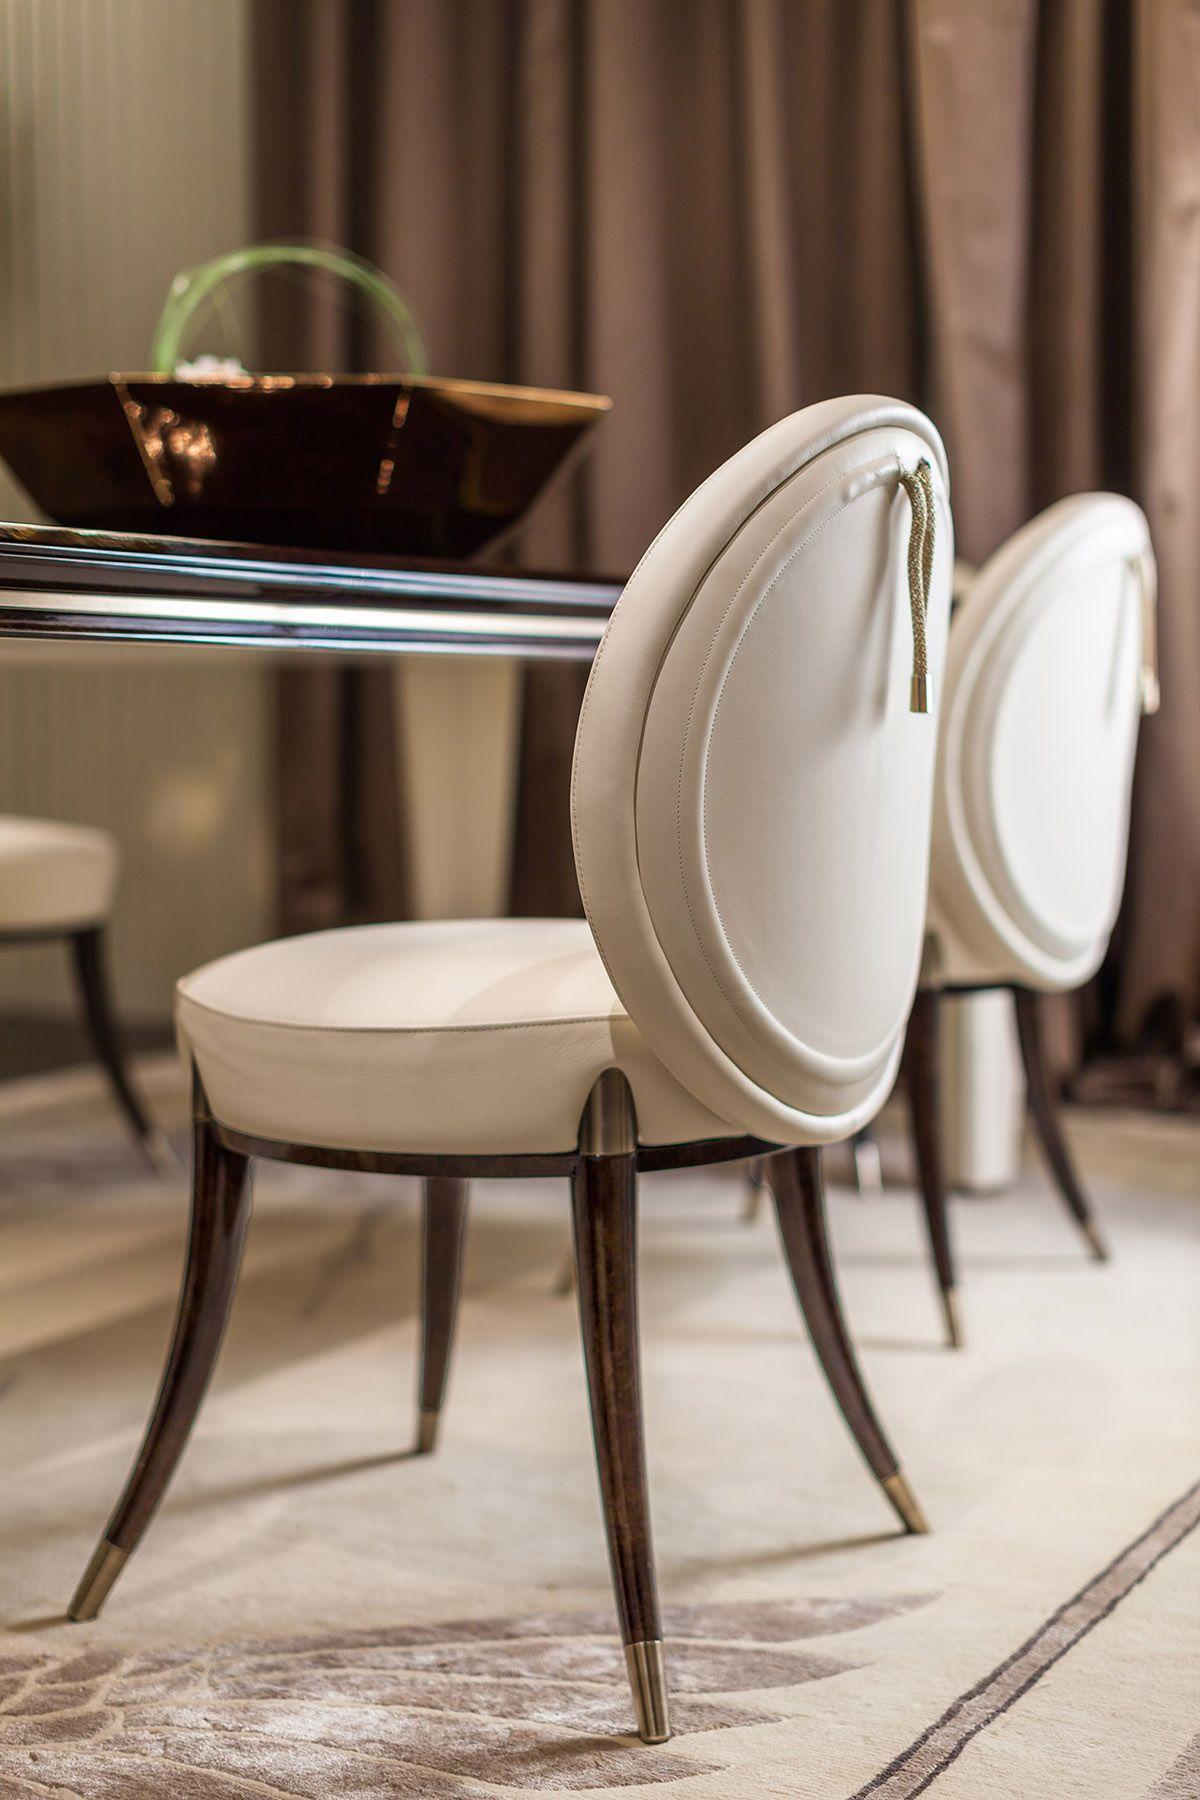 Noir collection www turri it italian luxury design chair